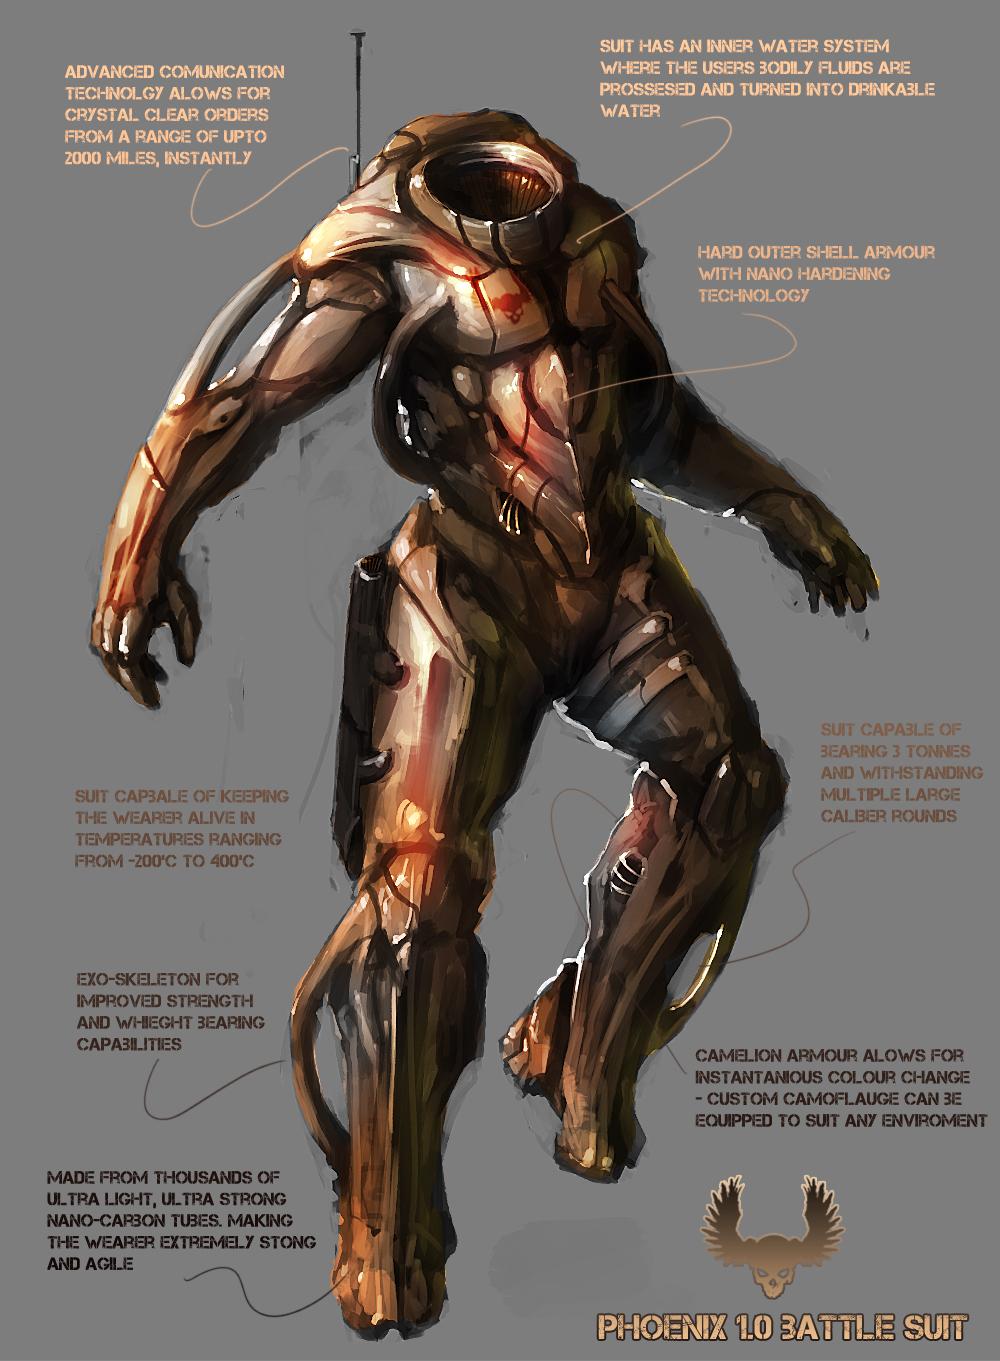 Phoenix Battle Suit by TomEdwardsConcepts on DeviantArt